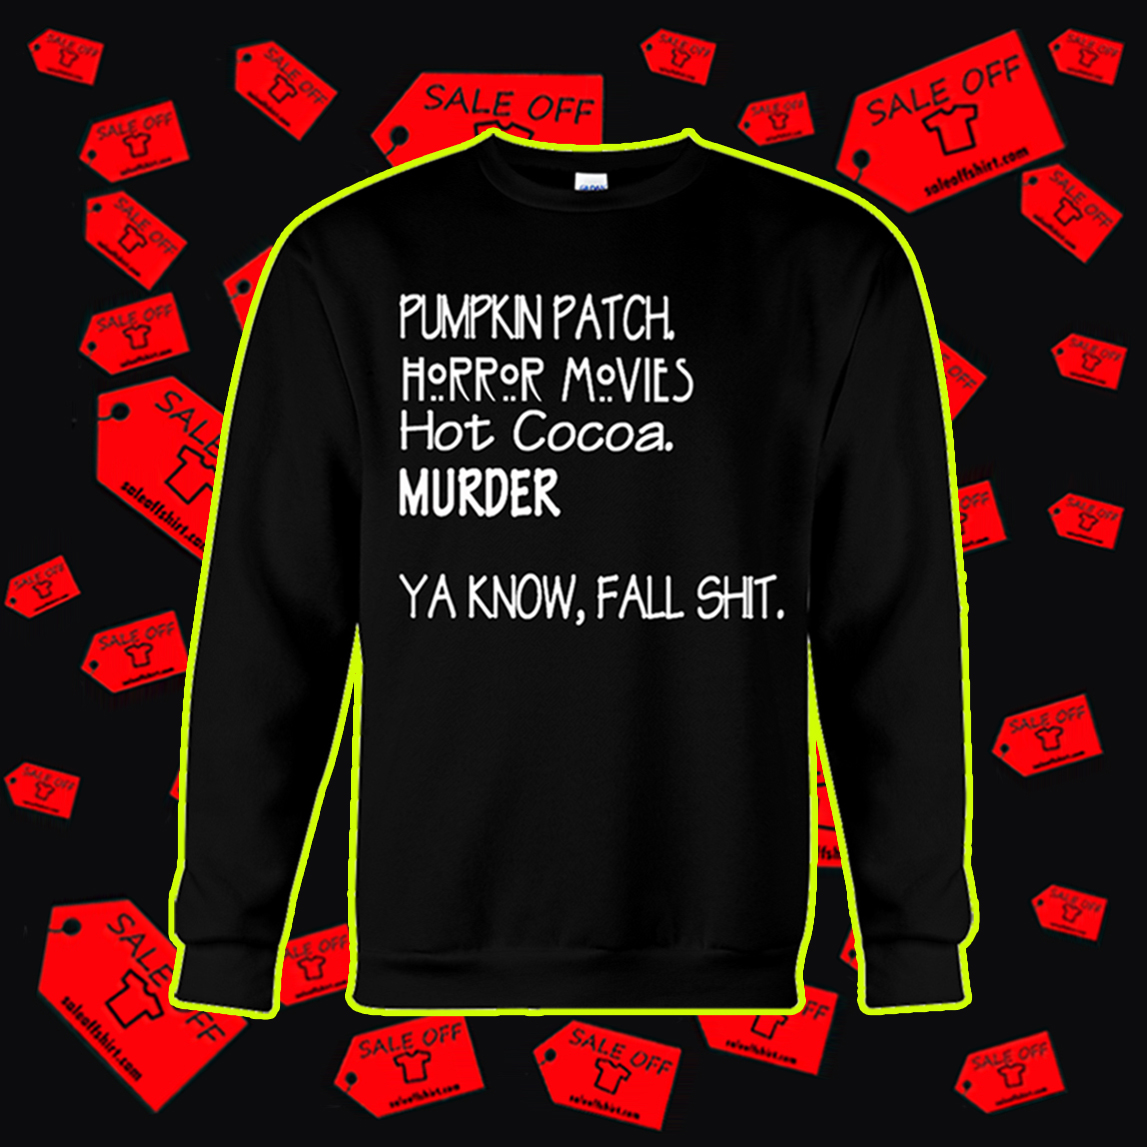 Pumpkin patch horror movies hot cocoa murder ya know fall shit sweatshirt